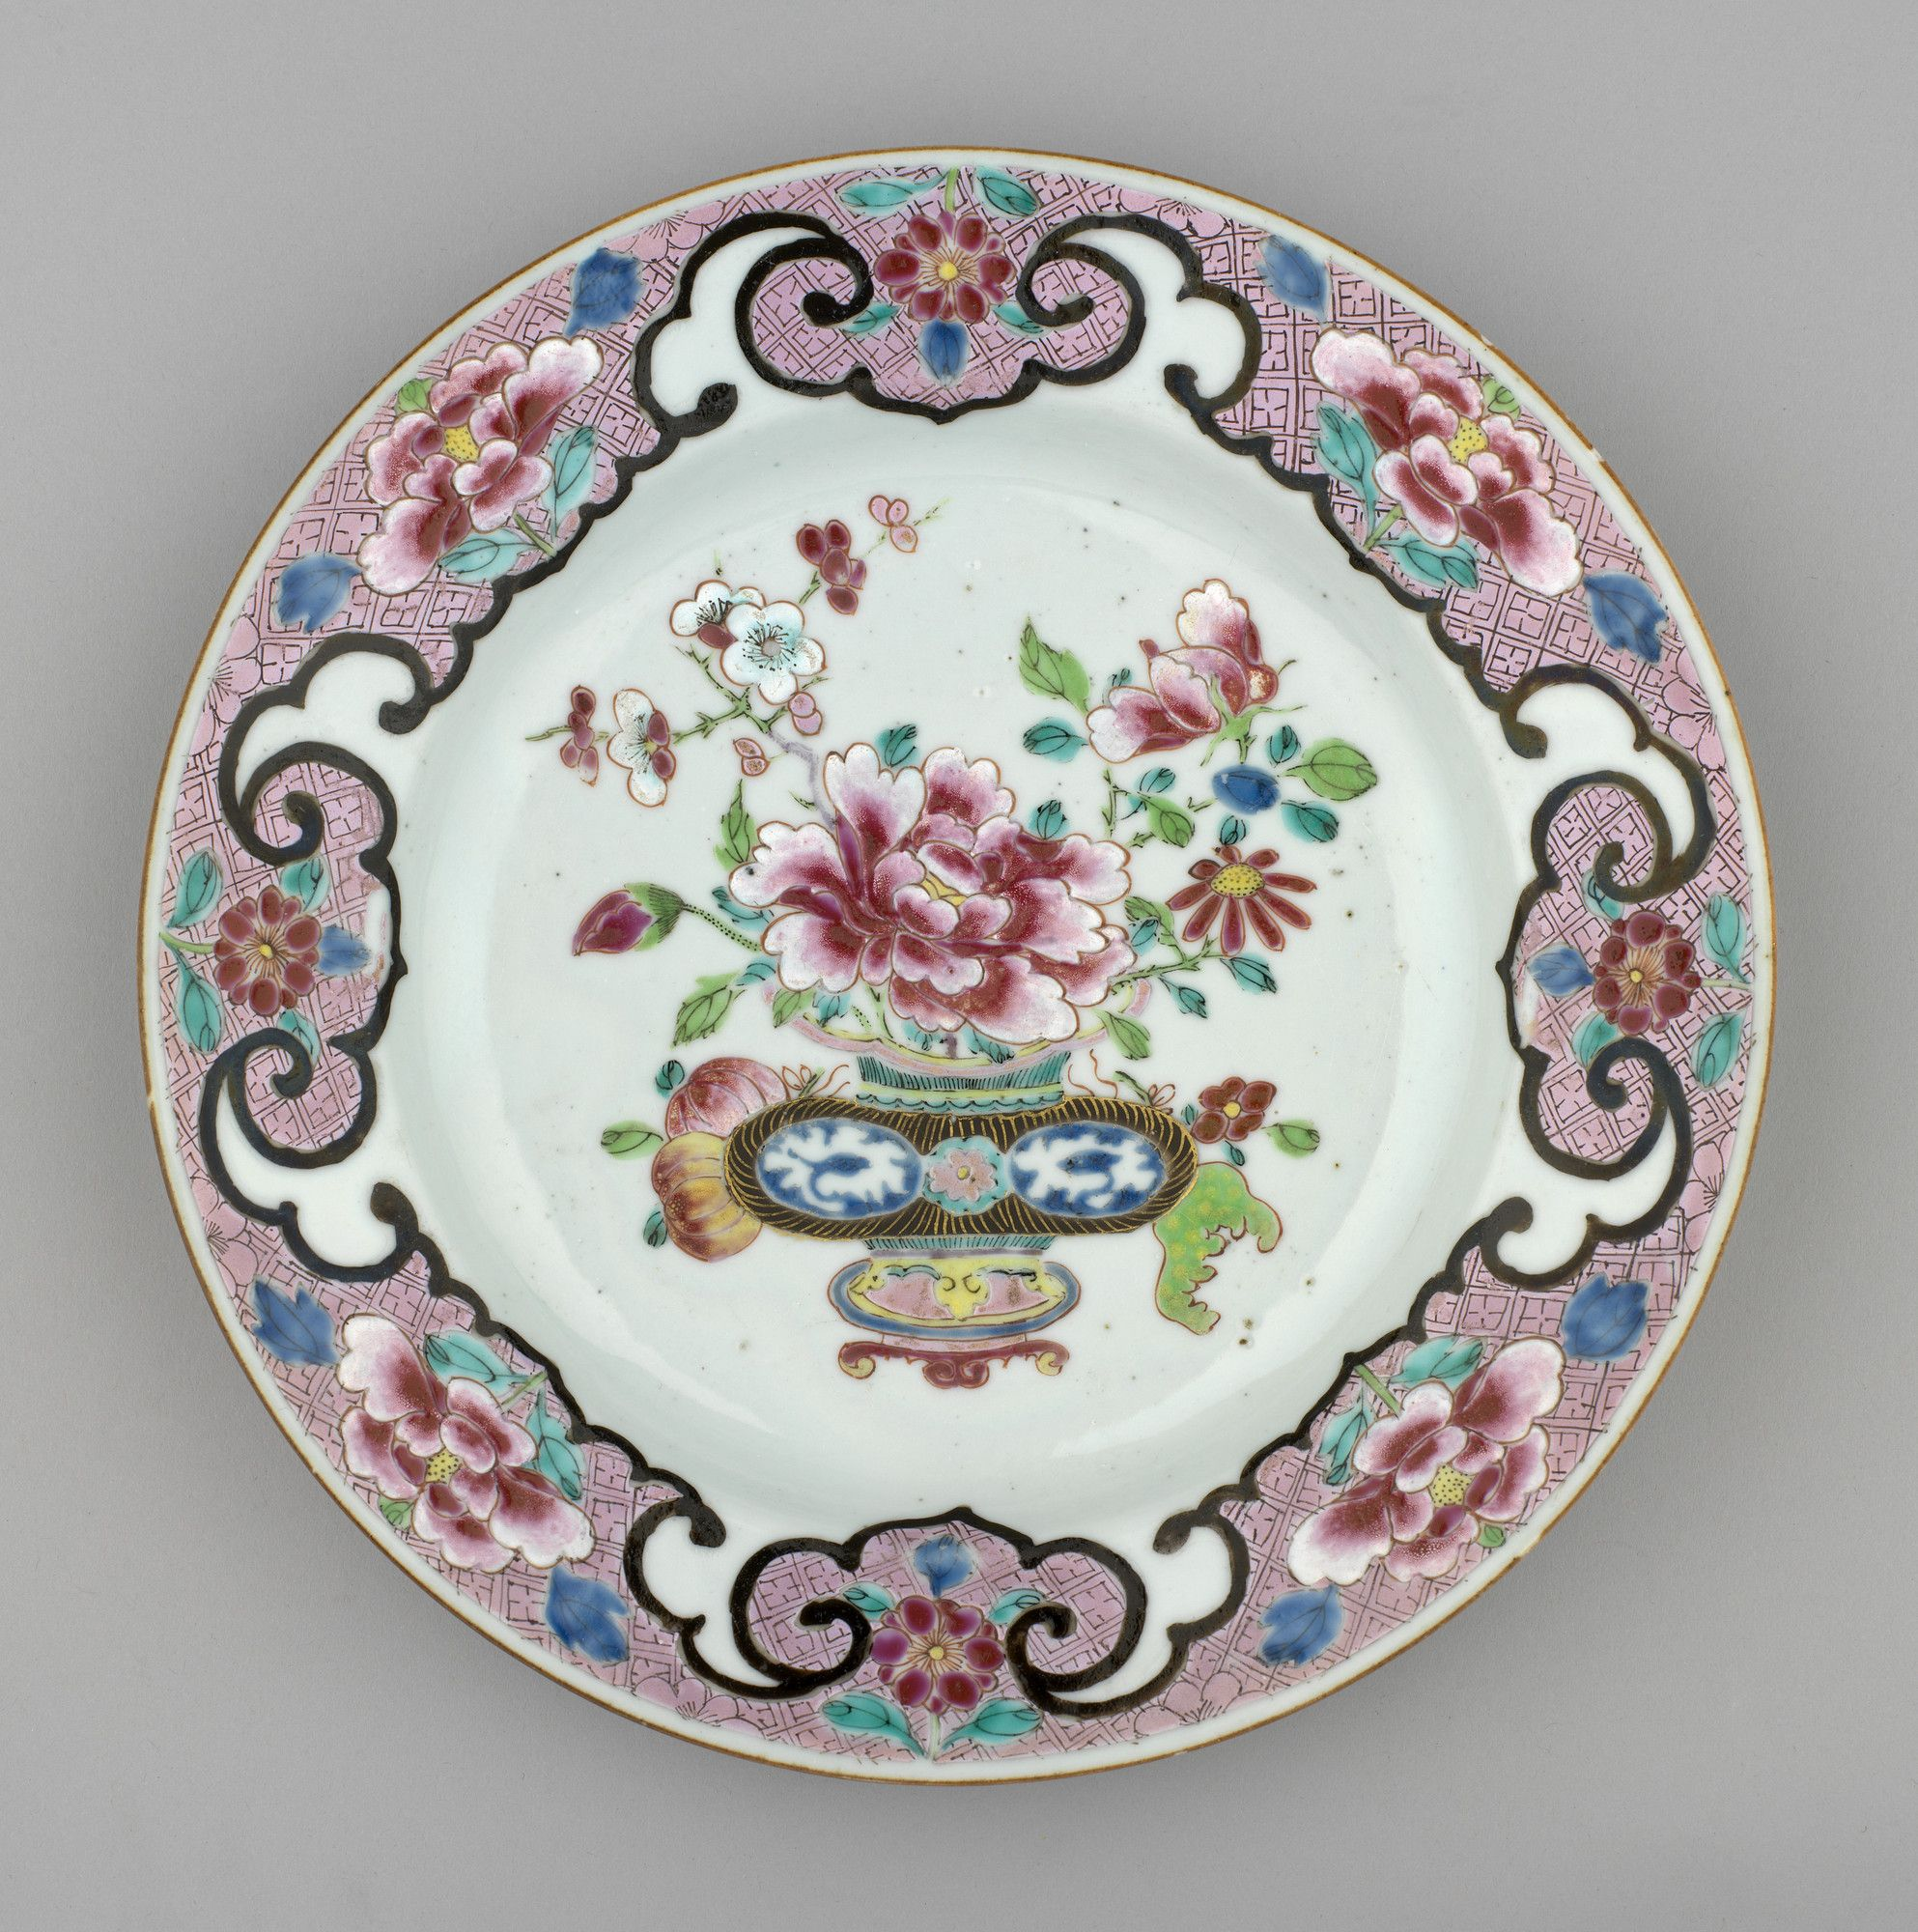 Jingdezhen Jiangxi Province China Set Of Plates Familia Rosa Porcelana Pintada Pratos Porcelana